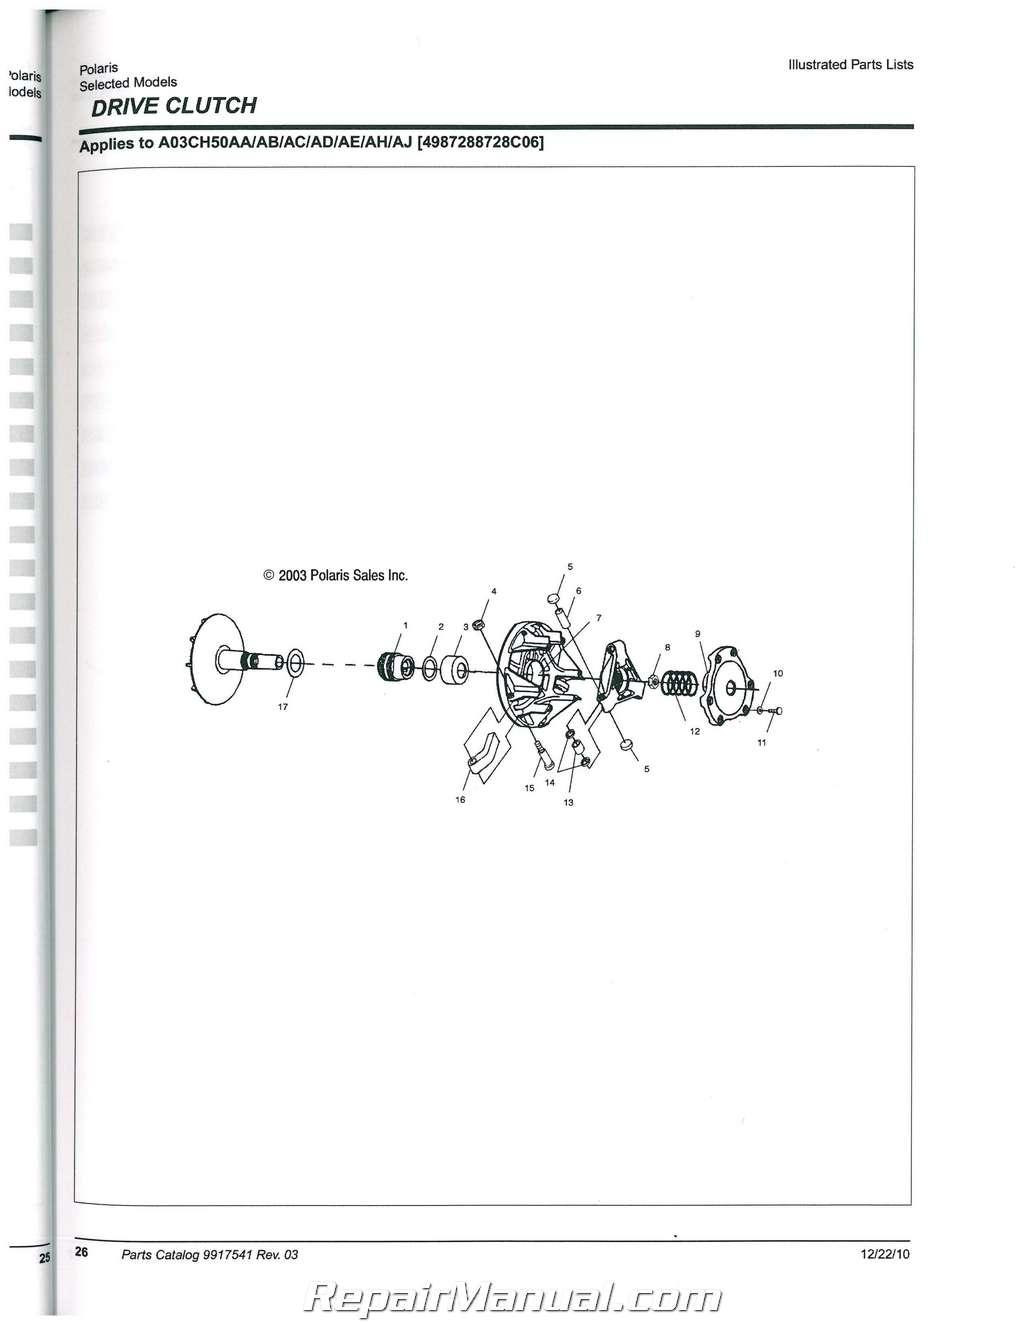 2003 Polaris Sportsman 500 Ho Parts Manual